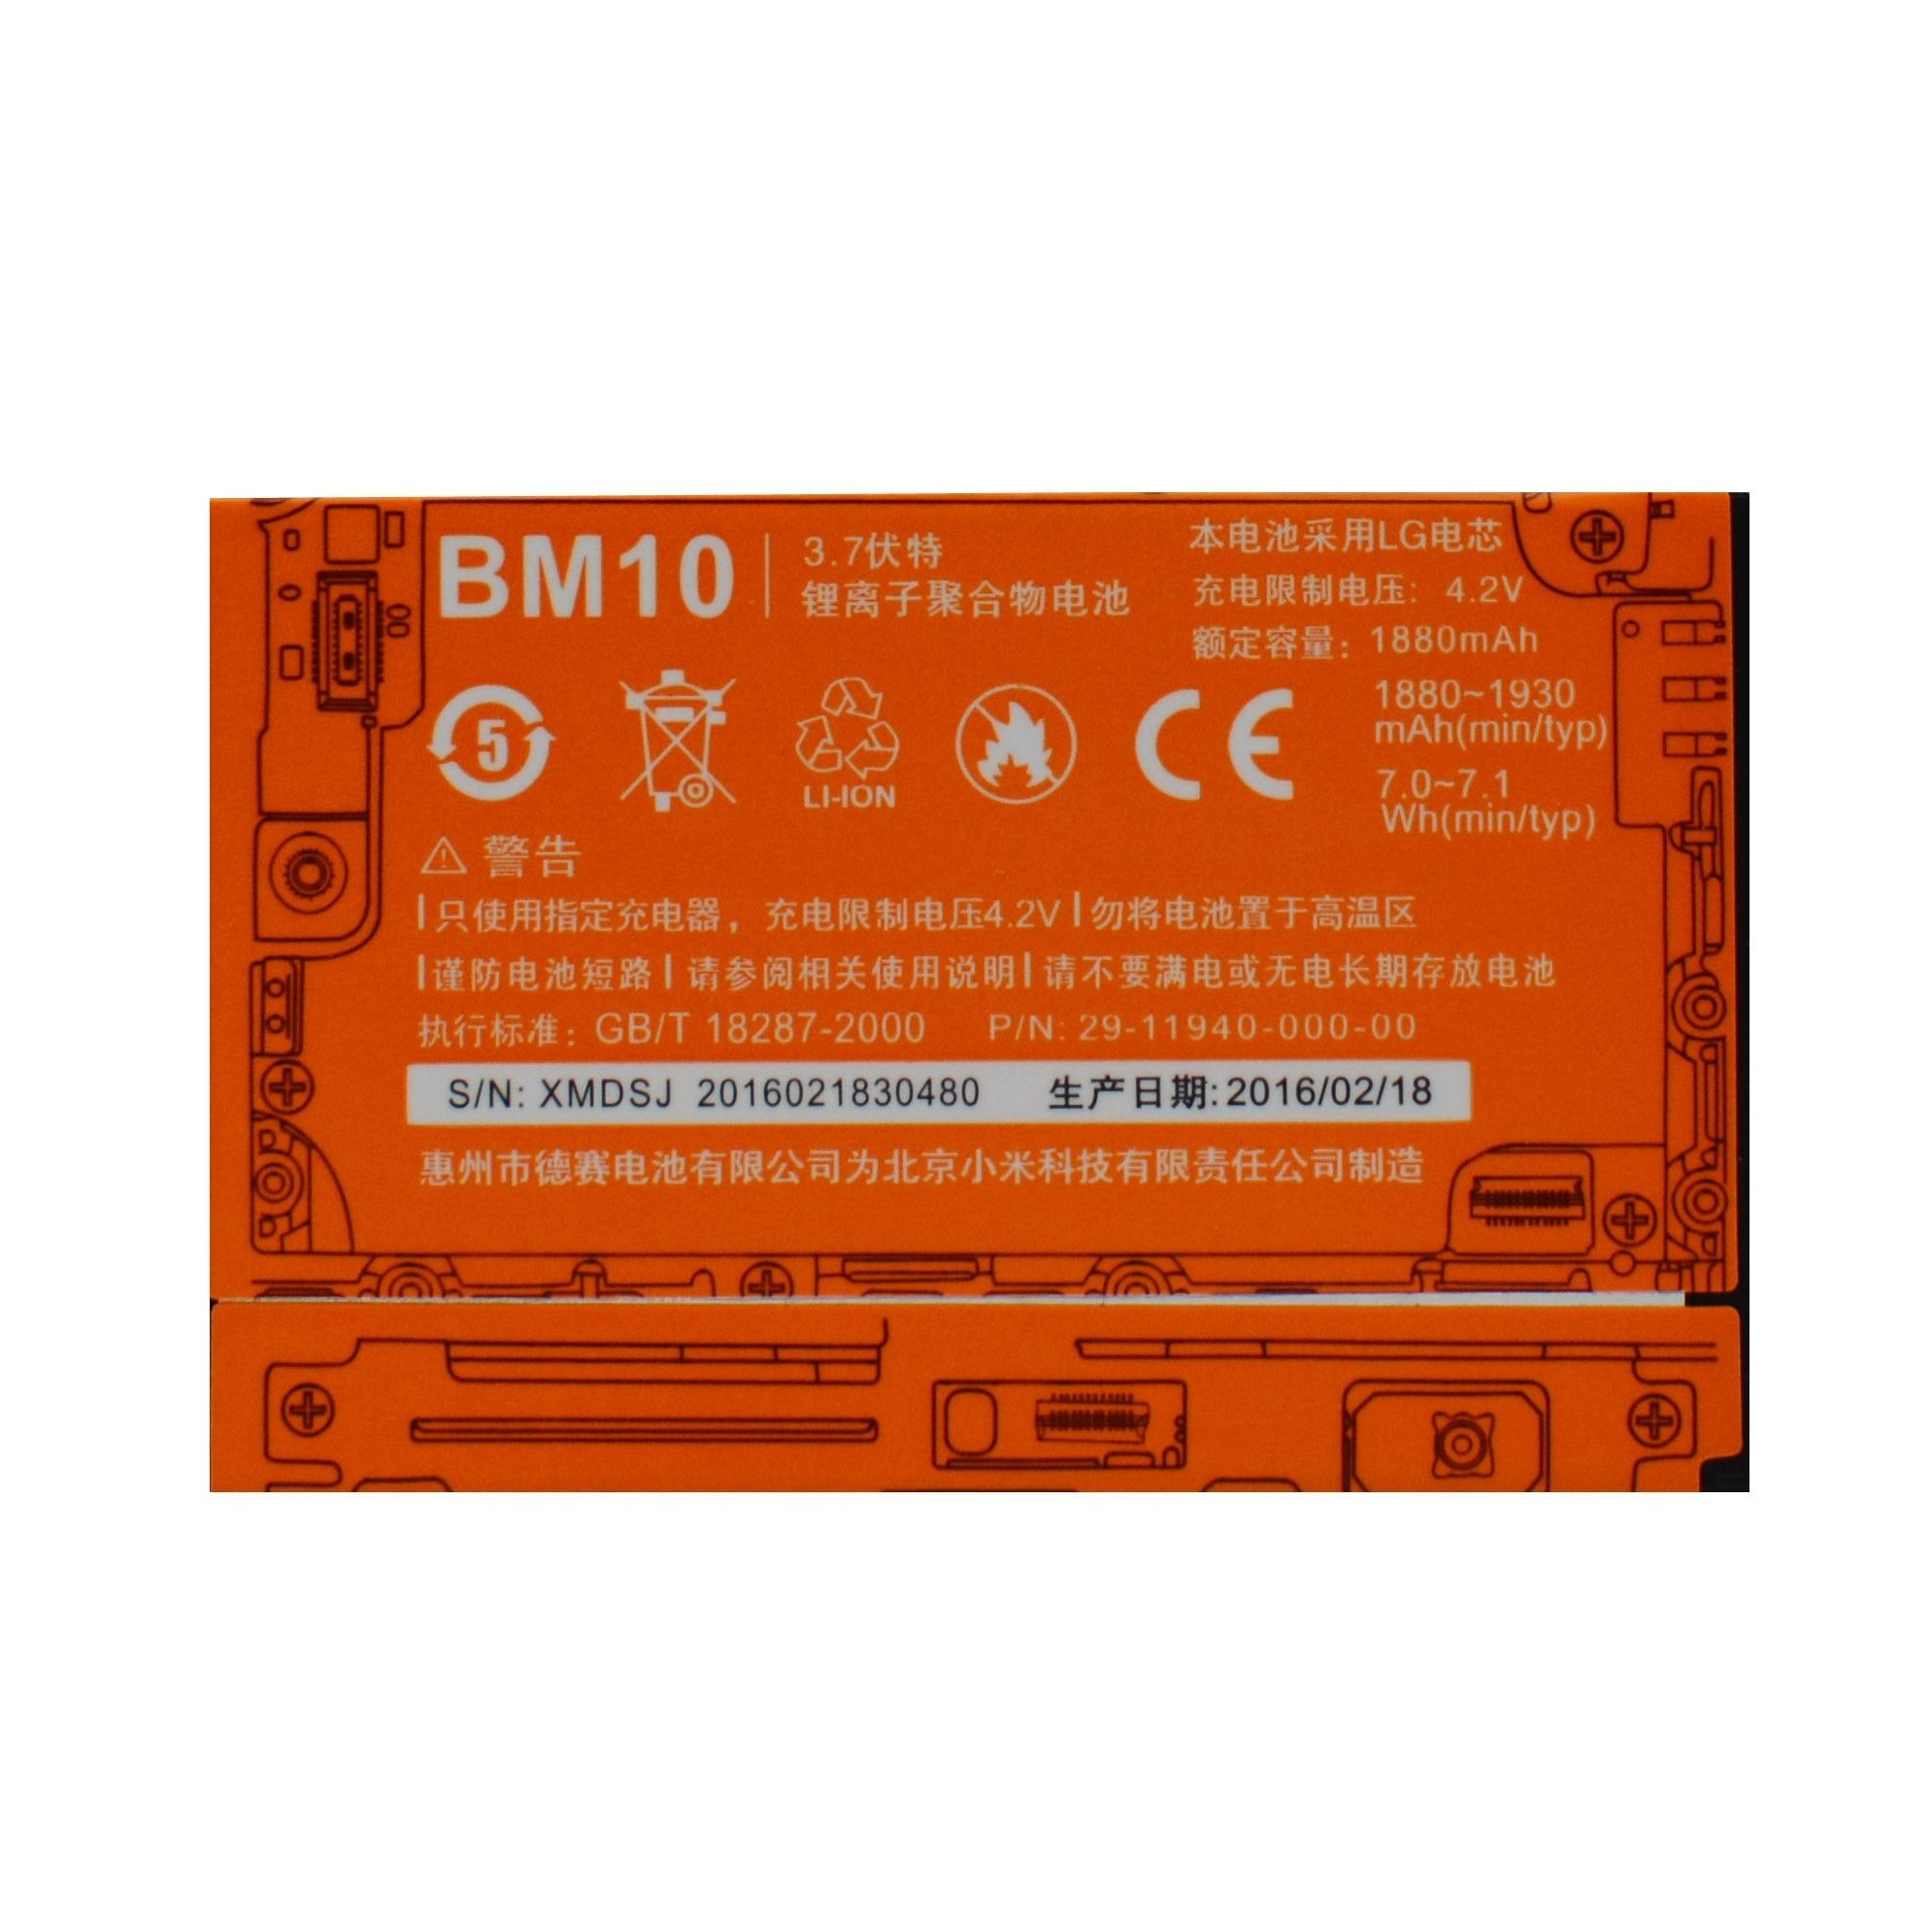 20pcs/lot Original Battery BM10 For Xiaomi M1 M1S 1 1s Mi1 Mi1s High Quality Rechargeable Phone Bateria Akku 1880mAh enlarge